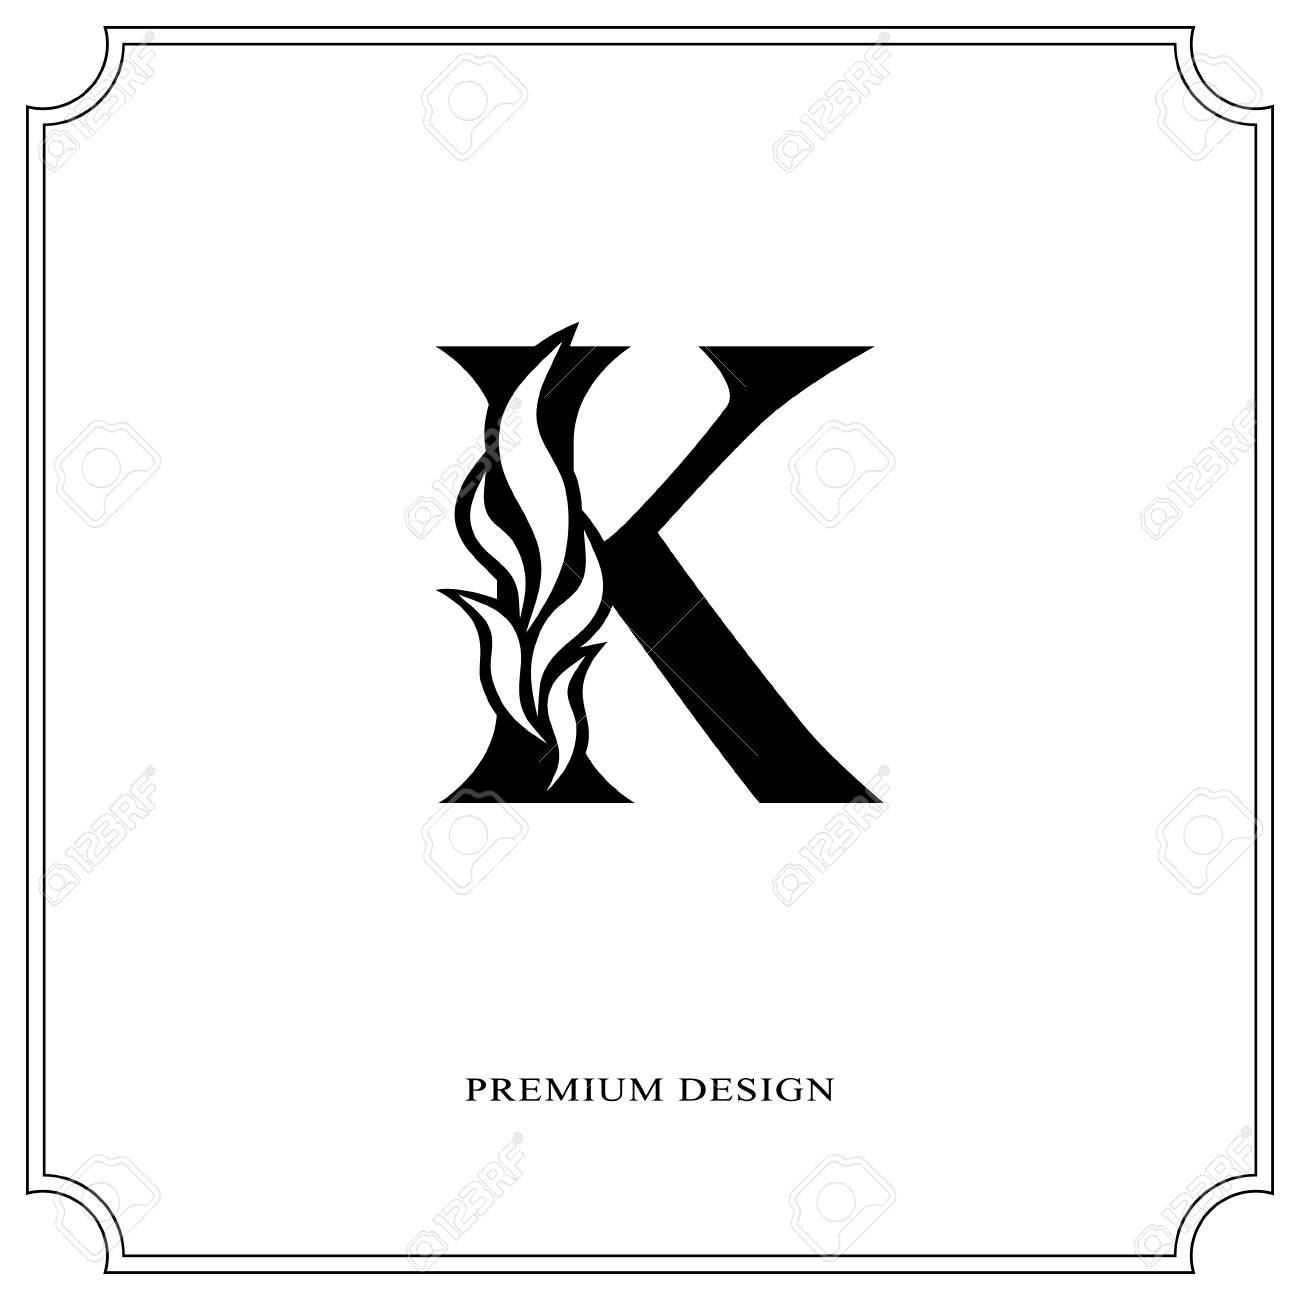 Elegant Letter K Graceful Royal Style Calligraphic Beautiful